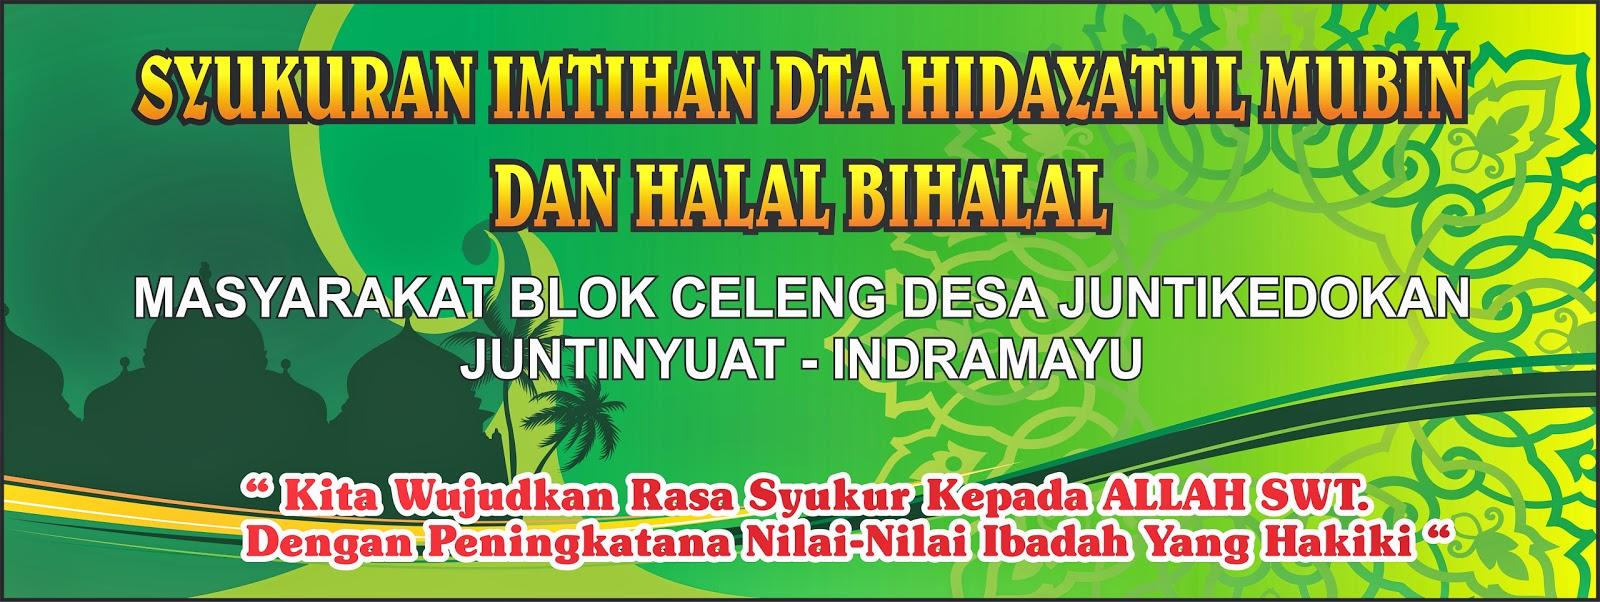 Spanduk Halal Bihalal Newhairstylesformen2014 Com